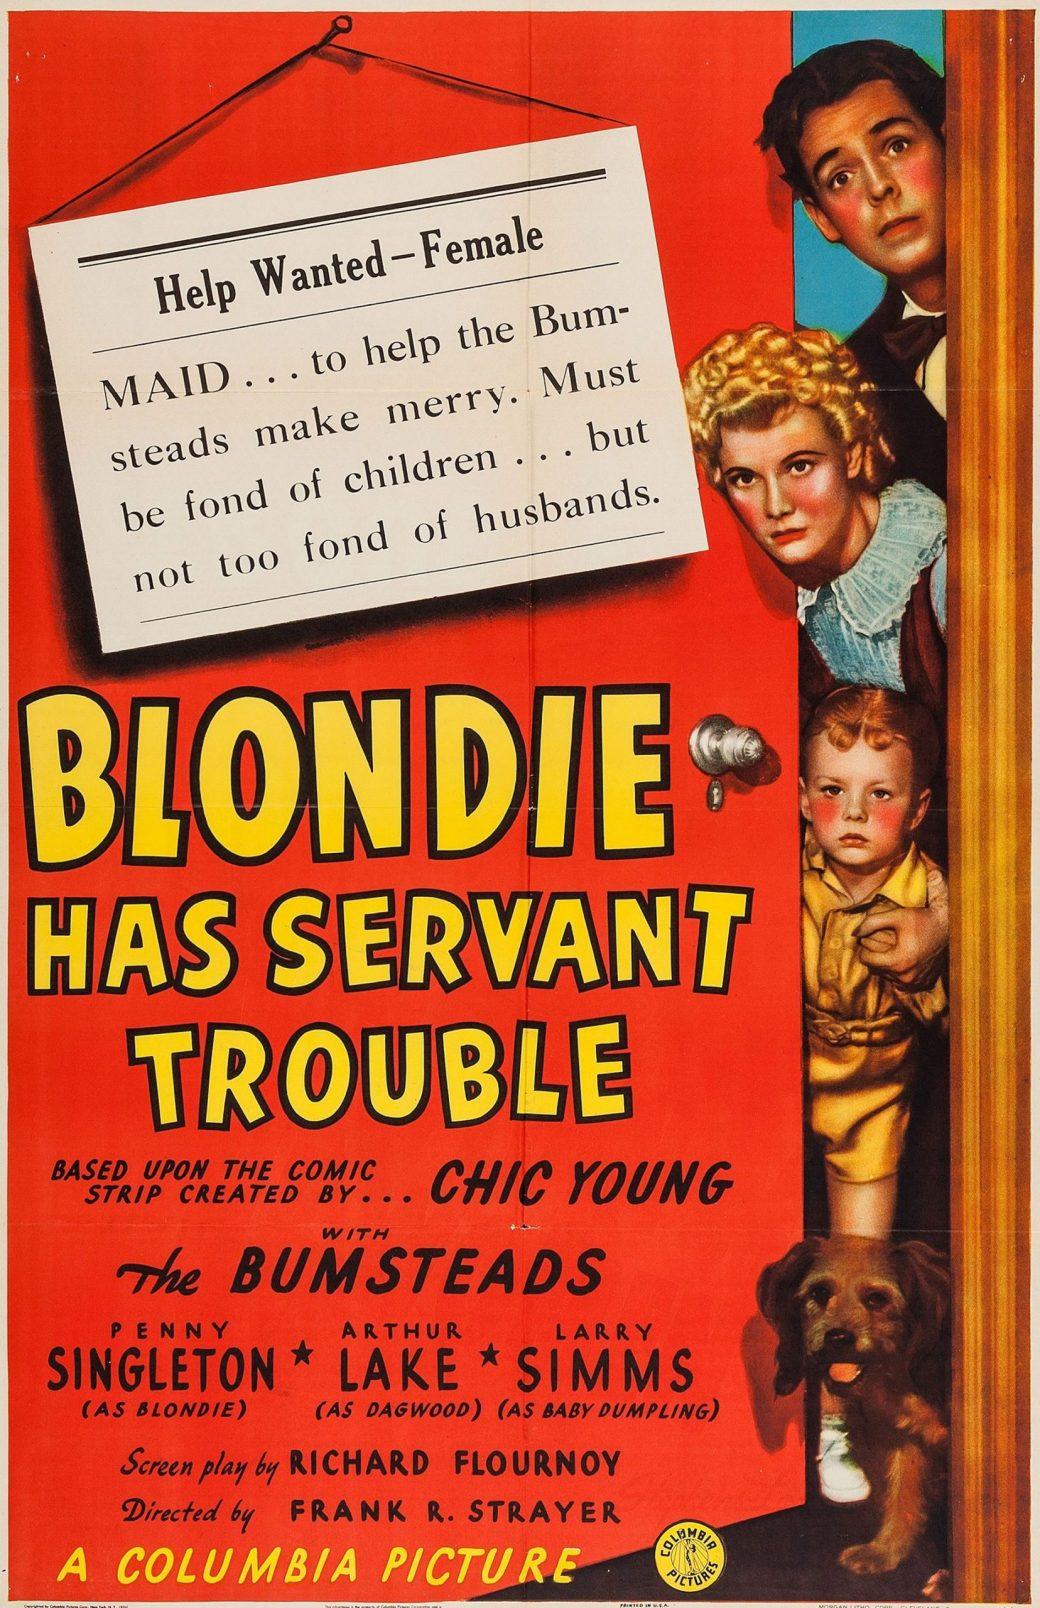 Filmen Blondie has servant trouble